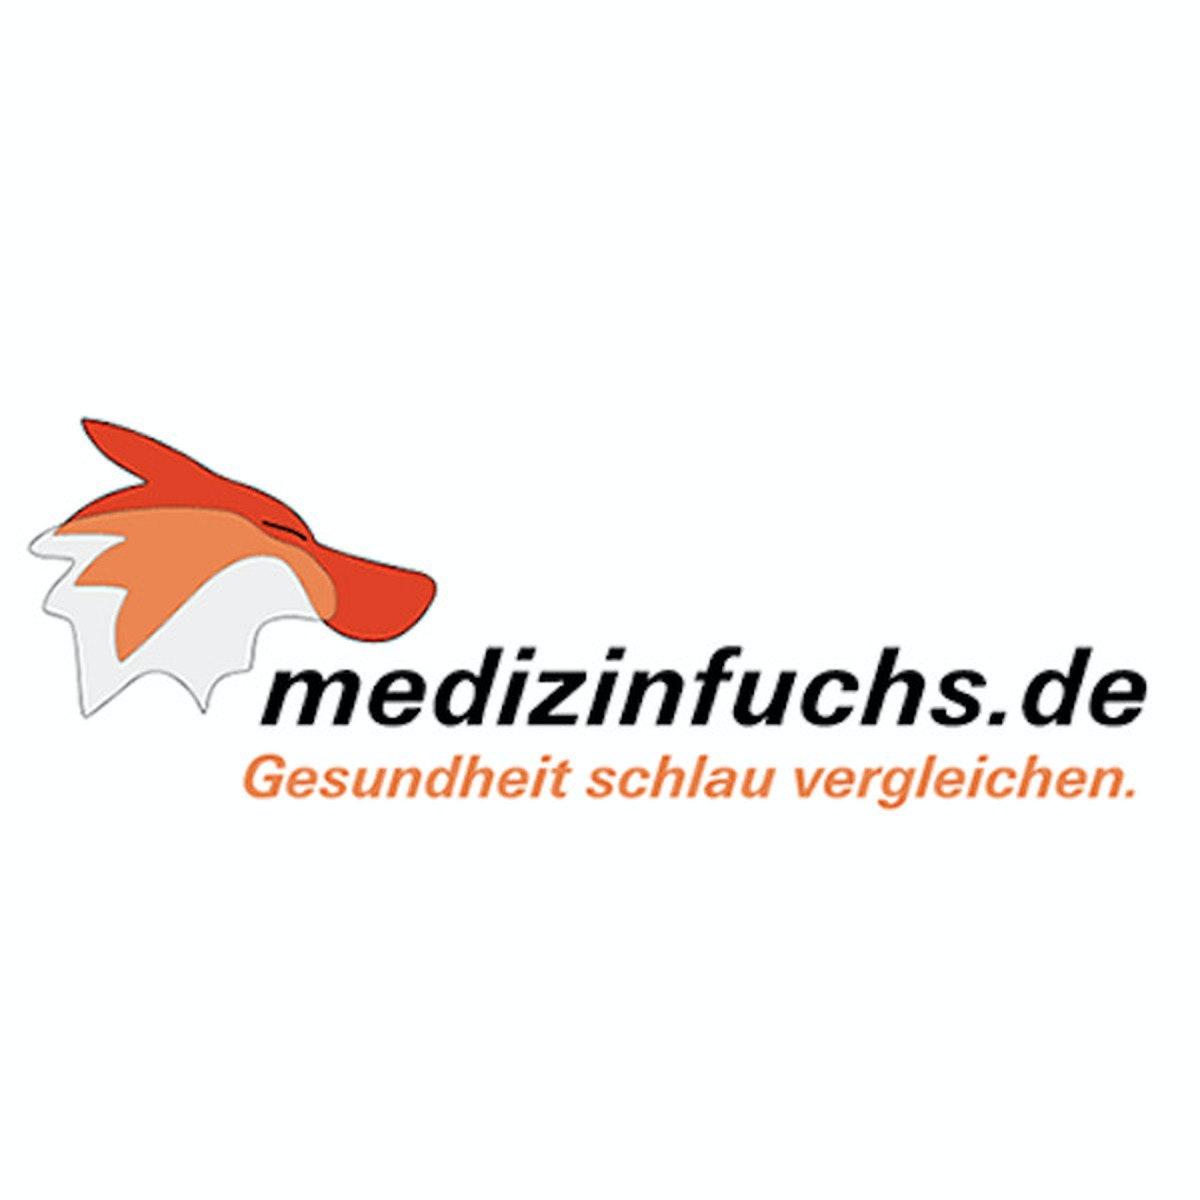 medizinfuchs GmbH